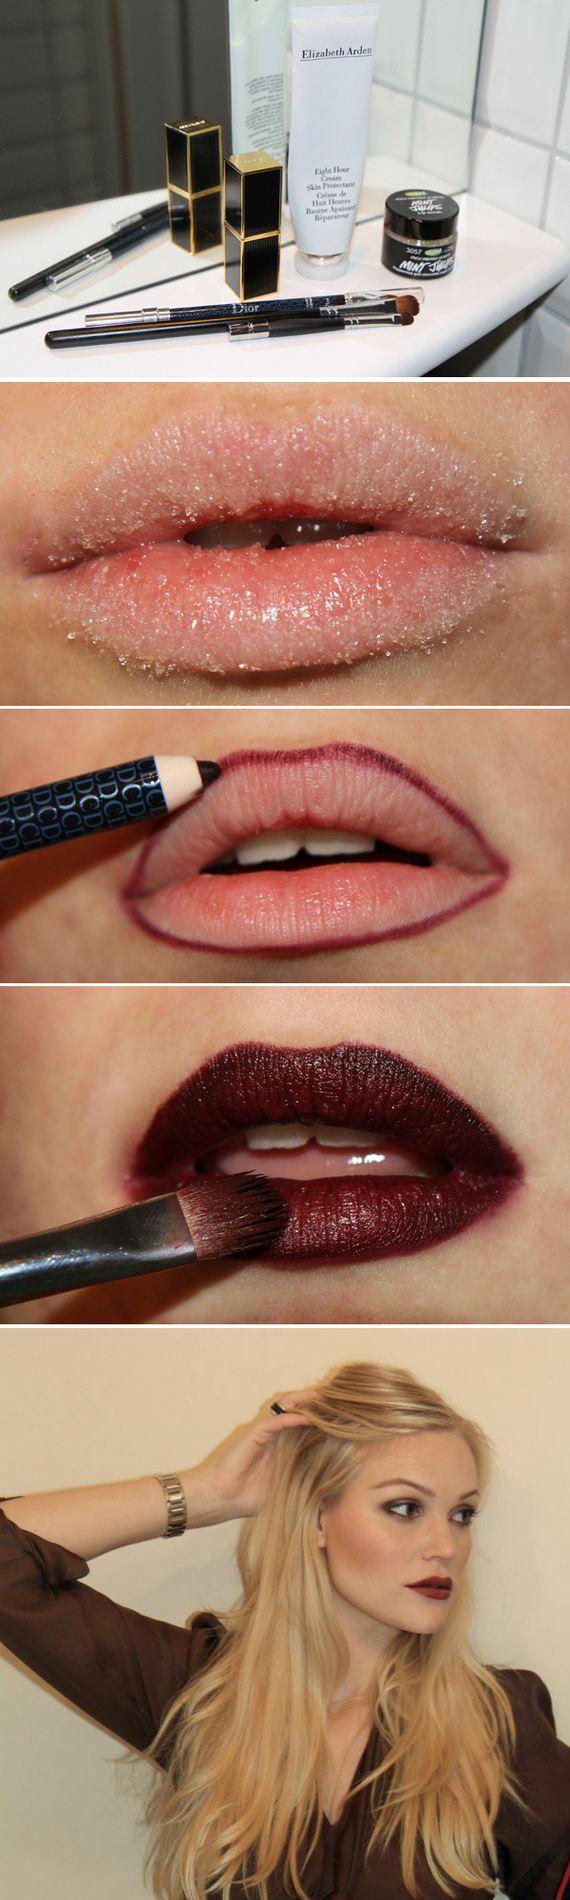 06-Lipstick-Tutorials